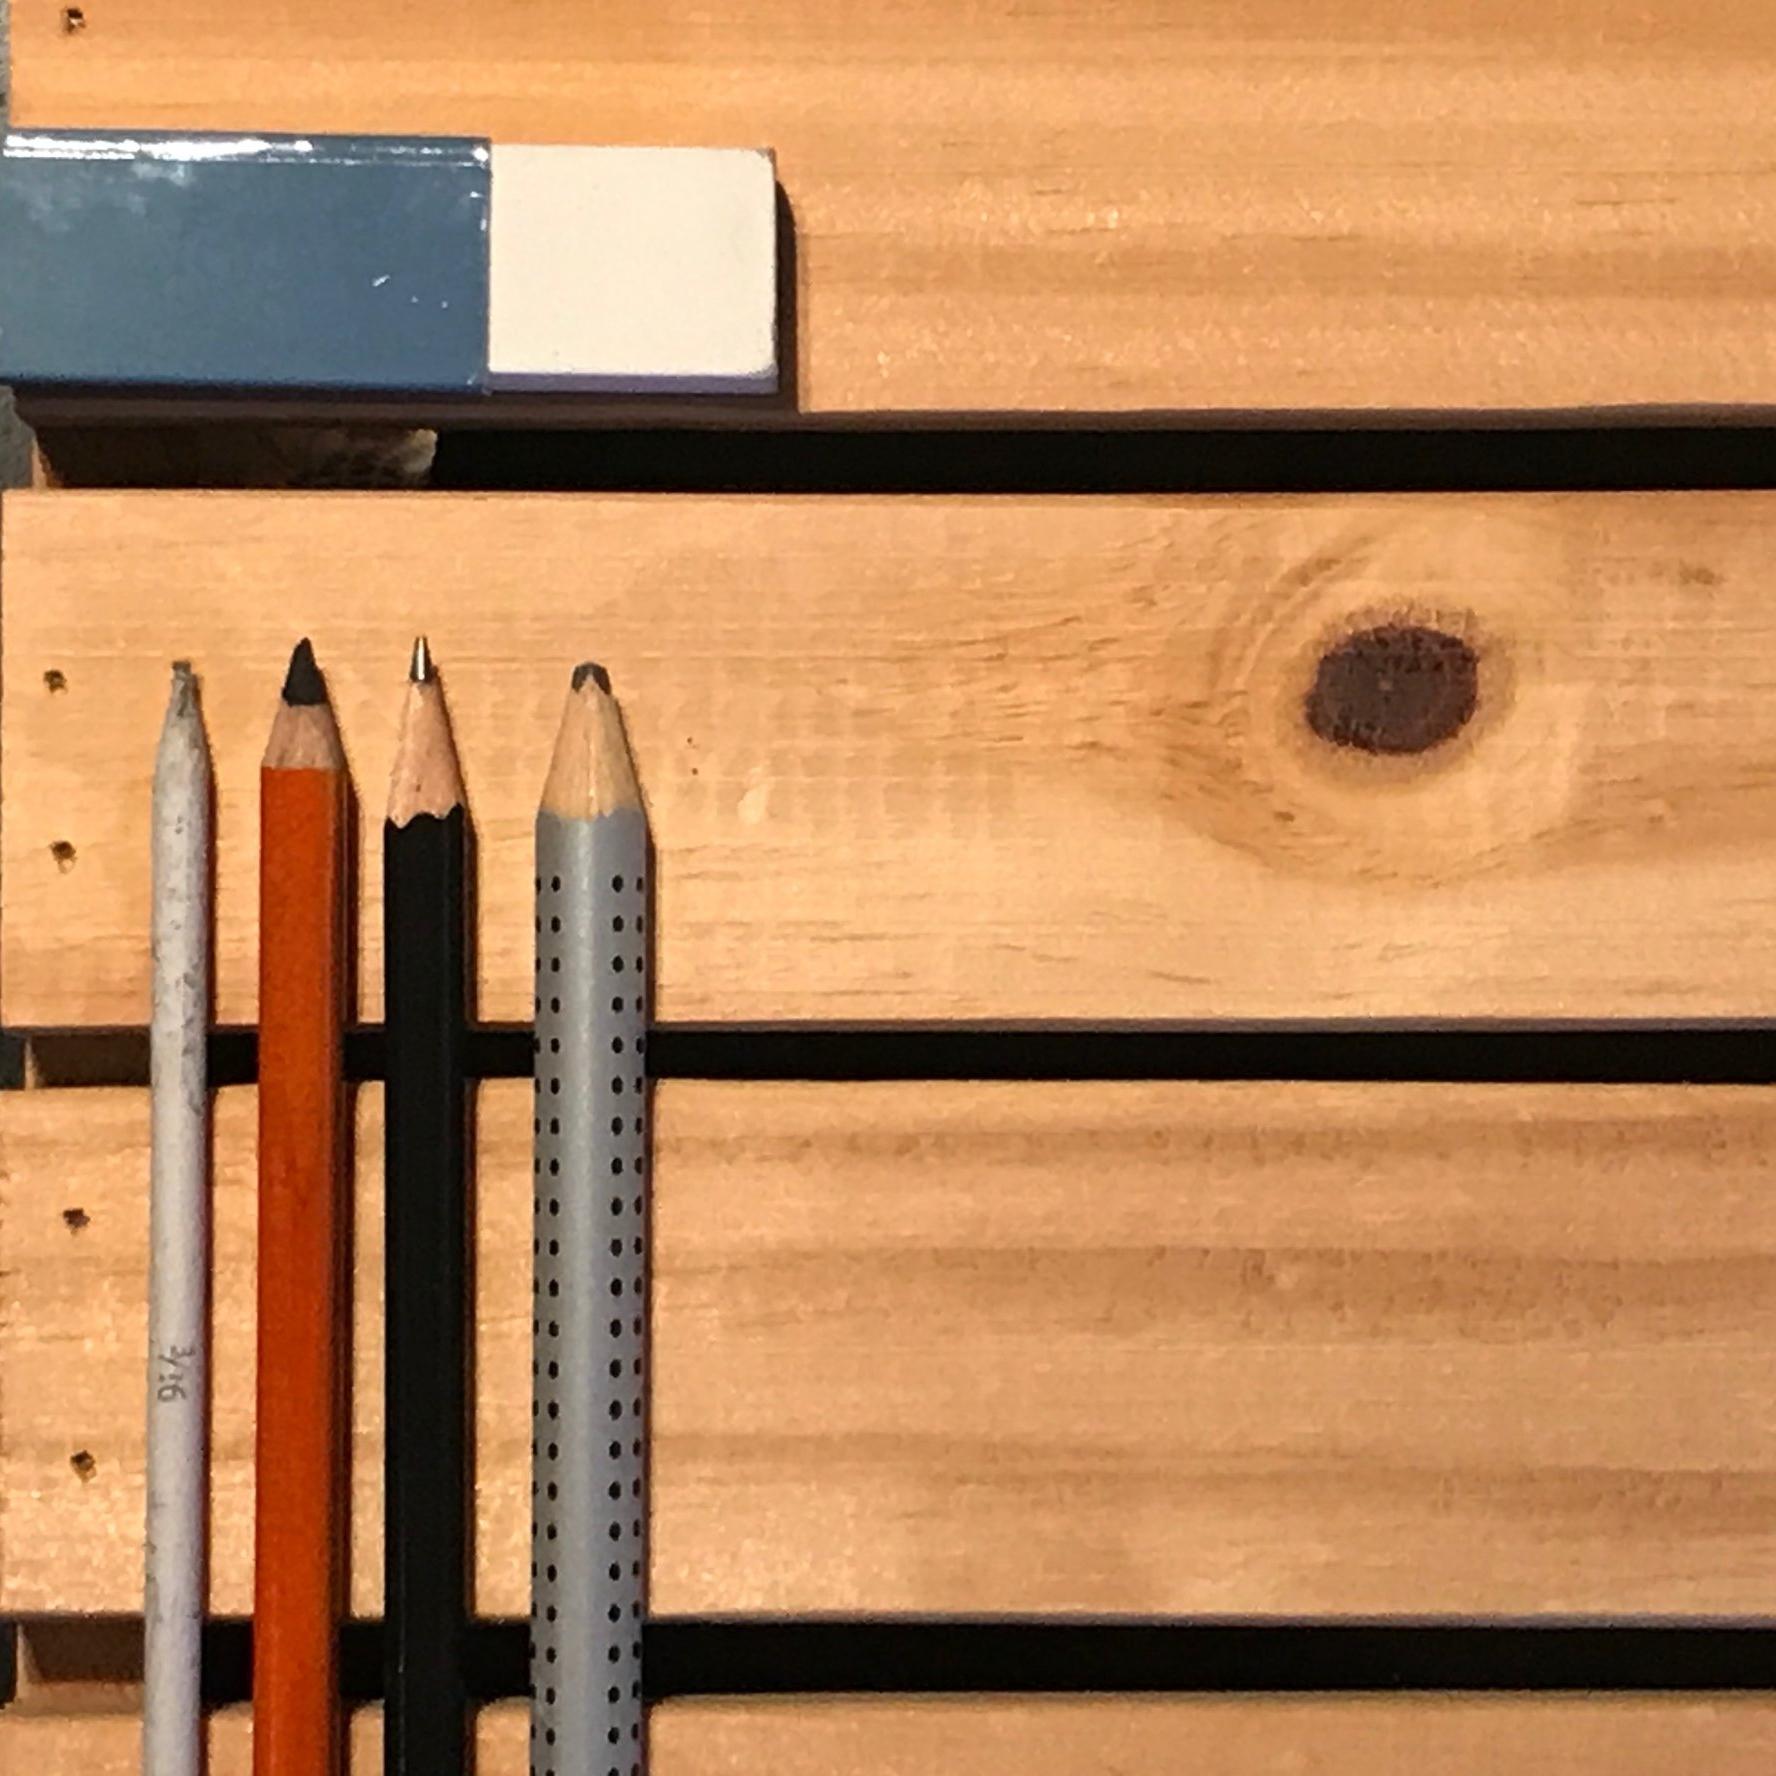 wood pencils & eraser close.jpg